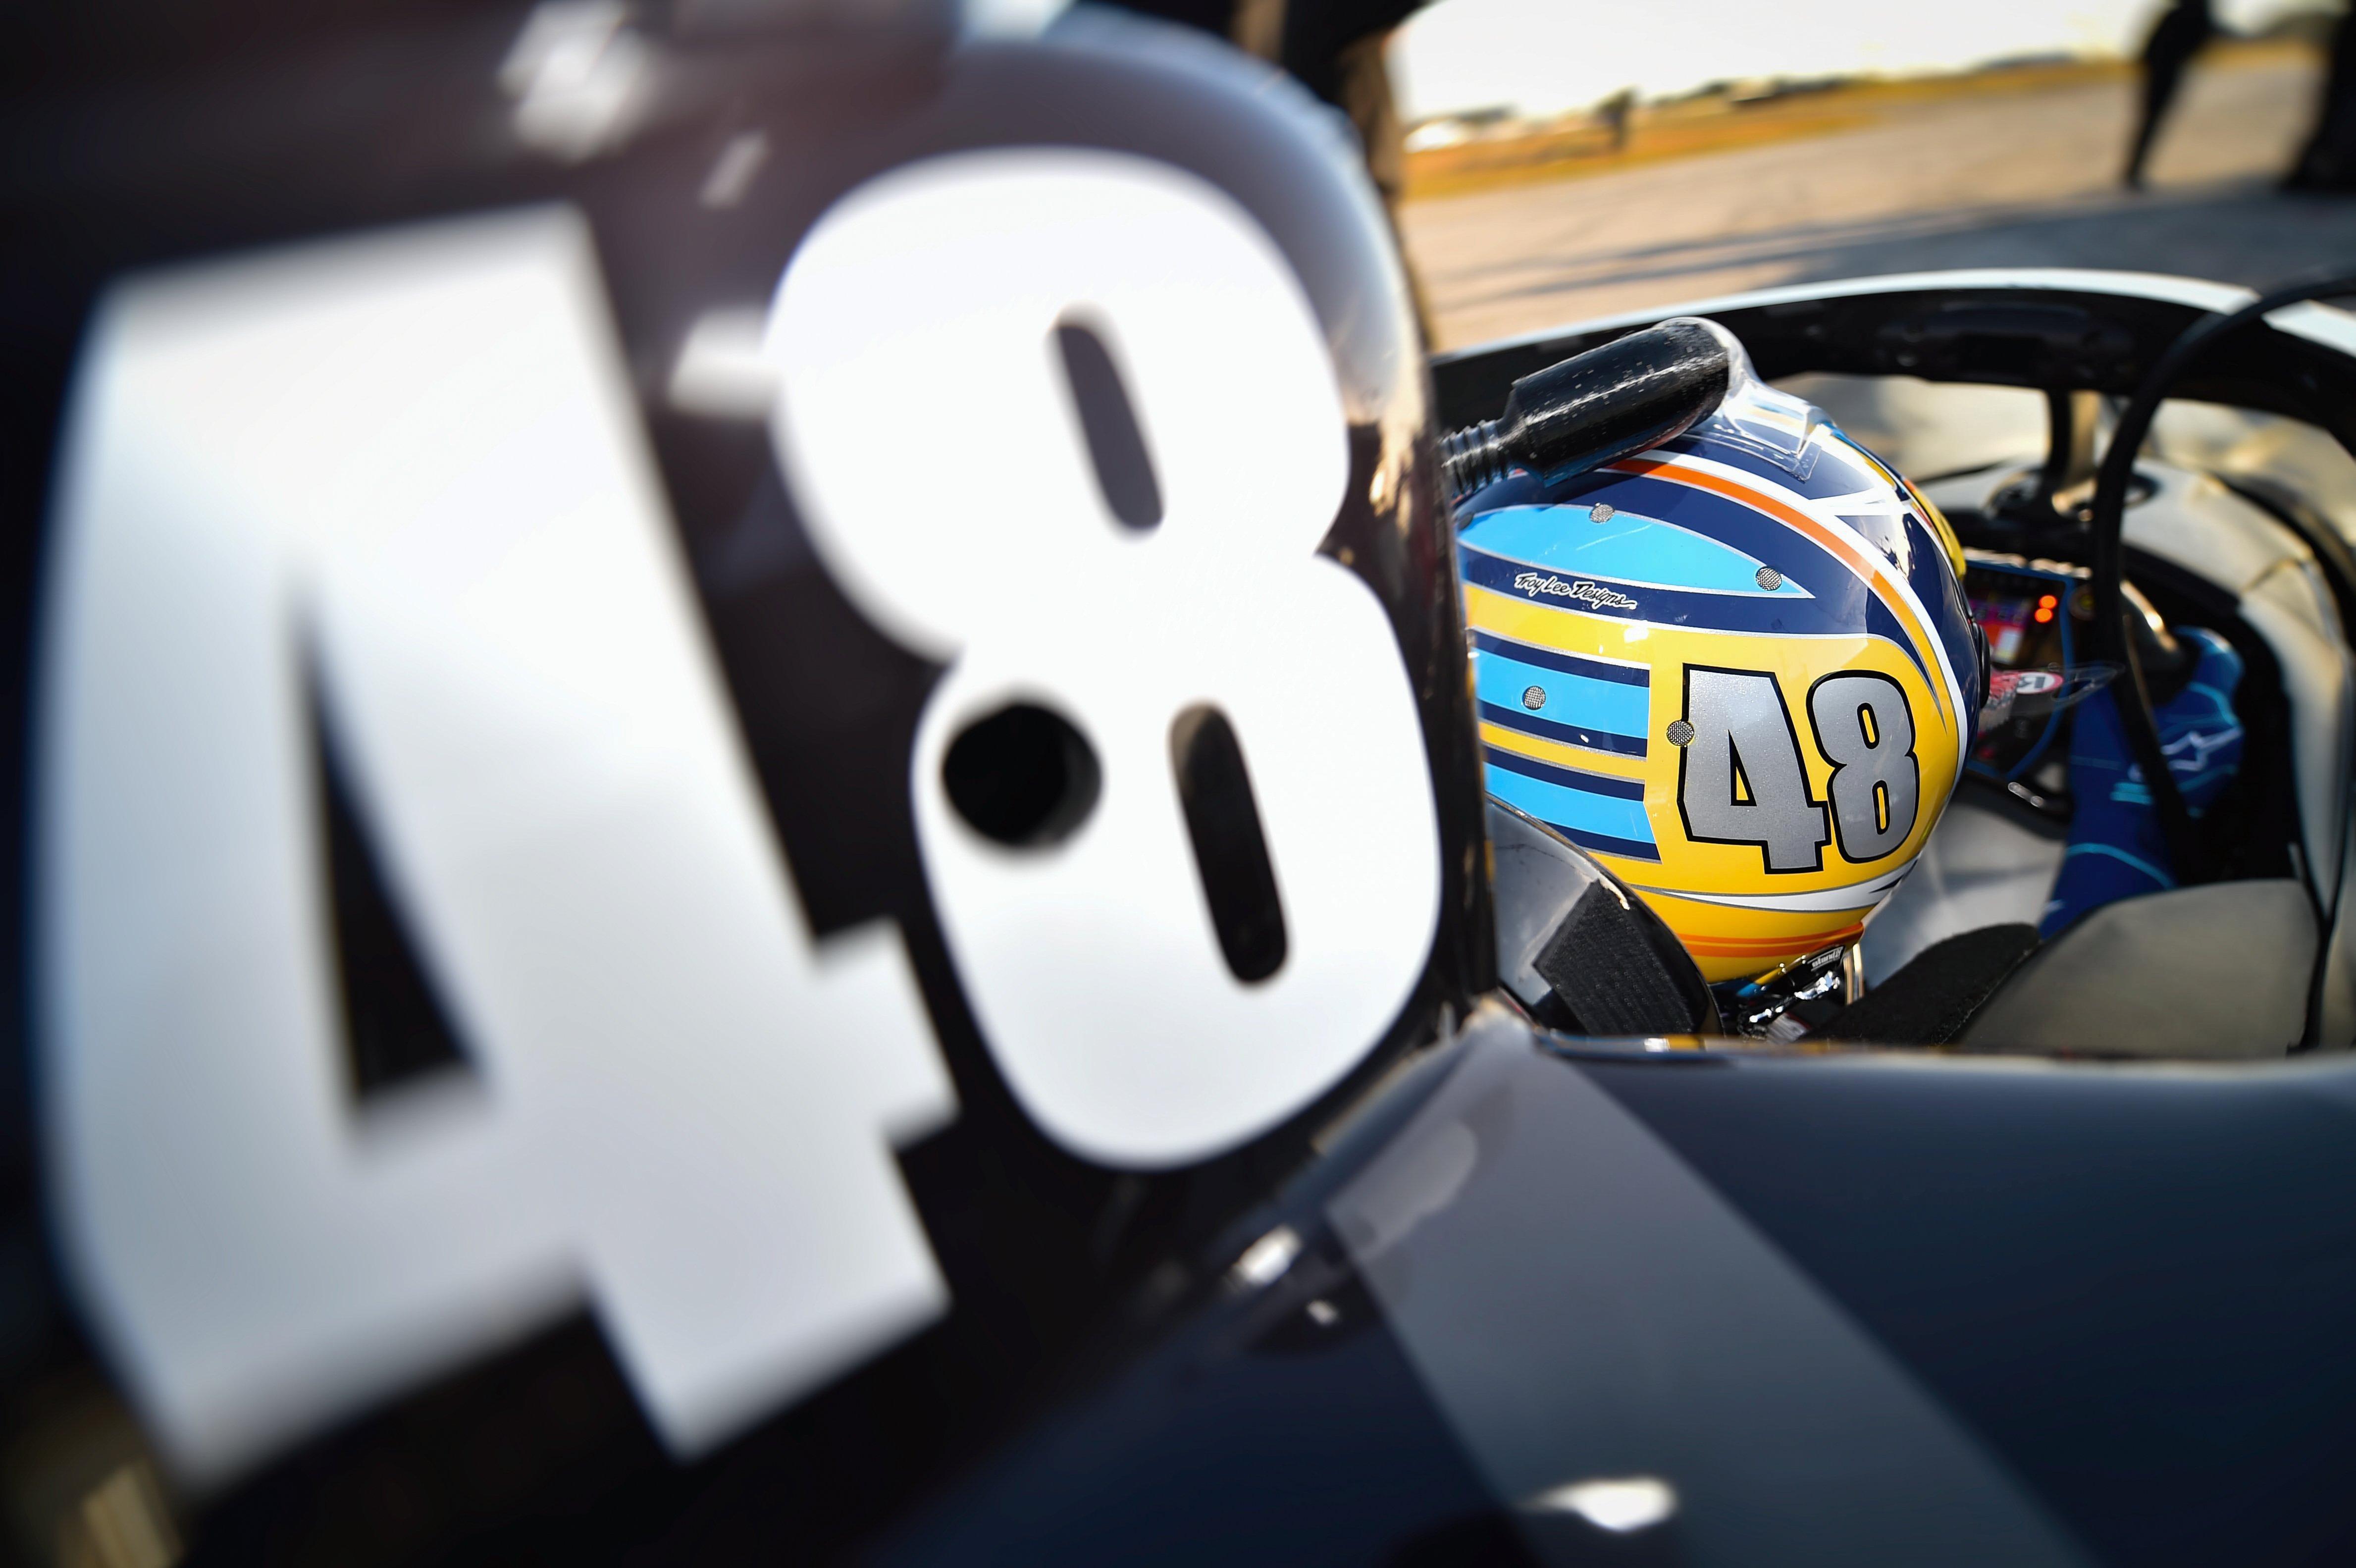 Jimmie Johnson - Chip Ganassi Racing - Indycar